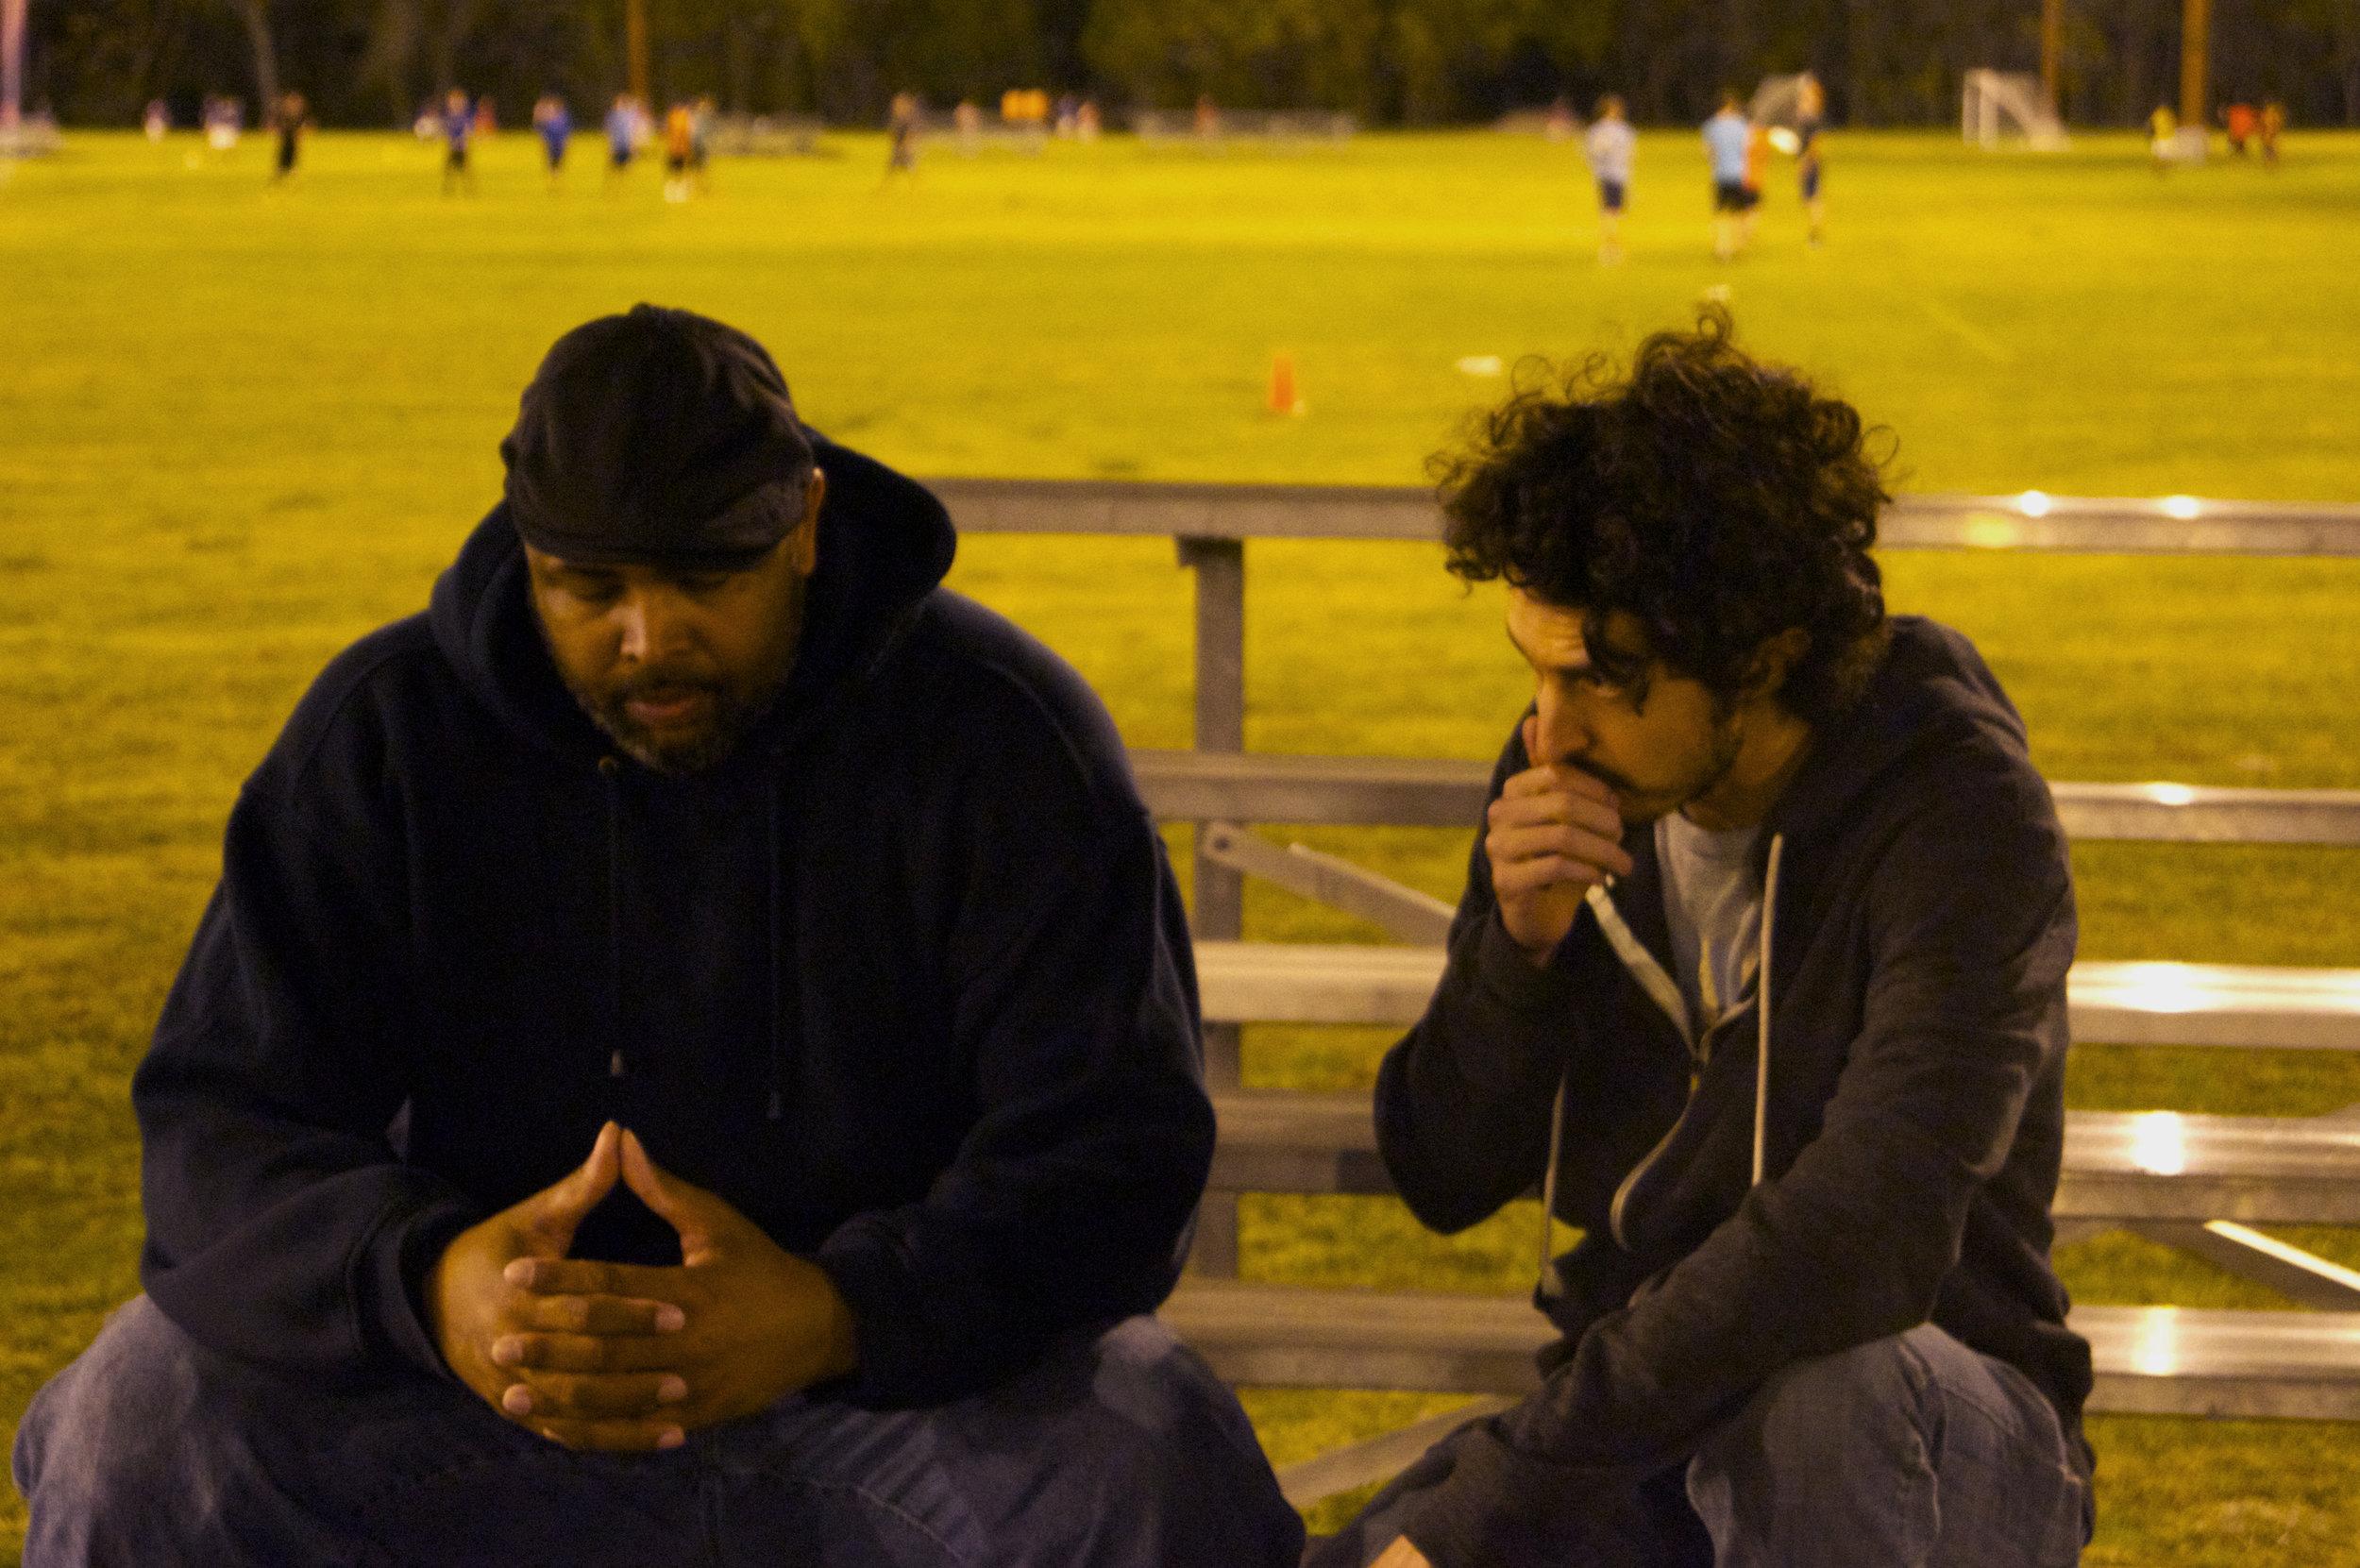 Game Night - Behind the Scenes with Director Joel Fendelman